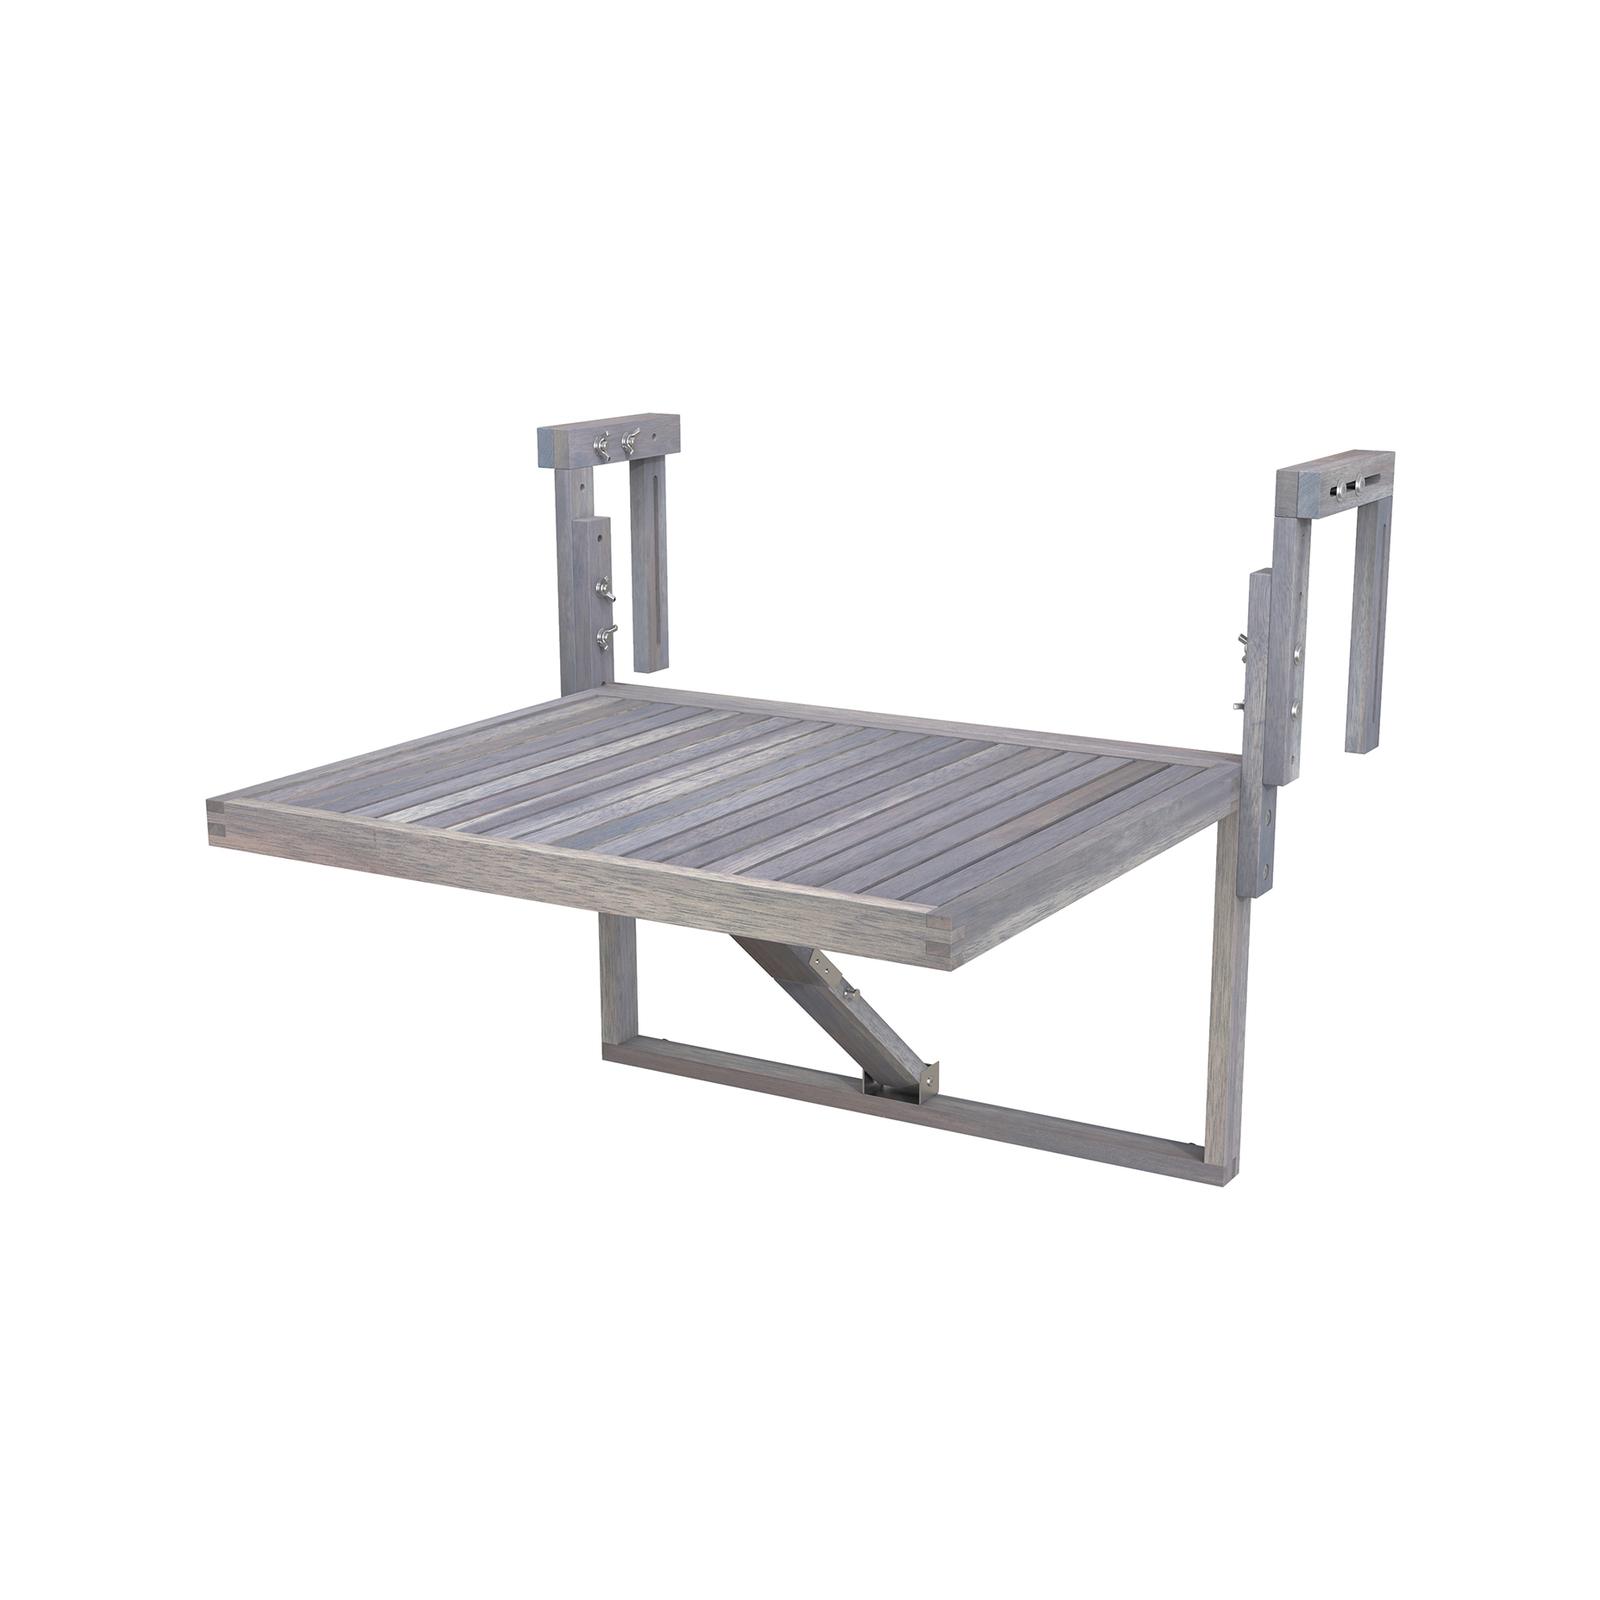 Interbuild 60 x 45cm Dusk Grey Toronto Folding Balcony Table